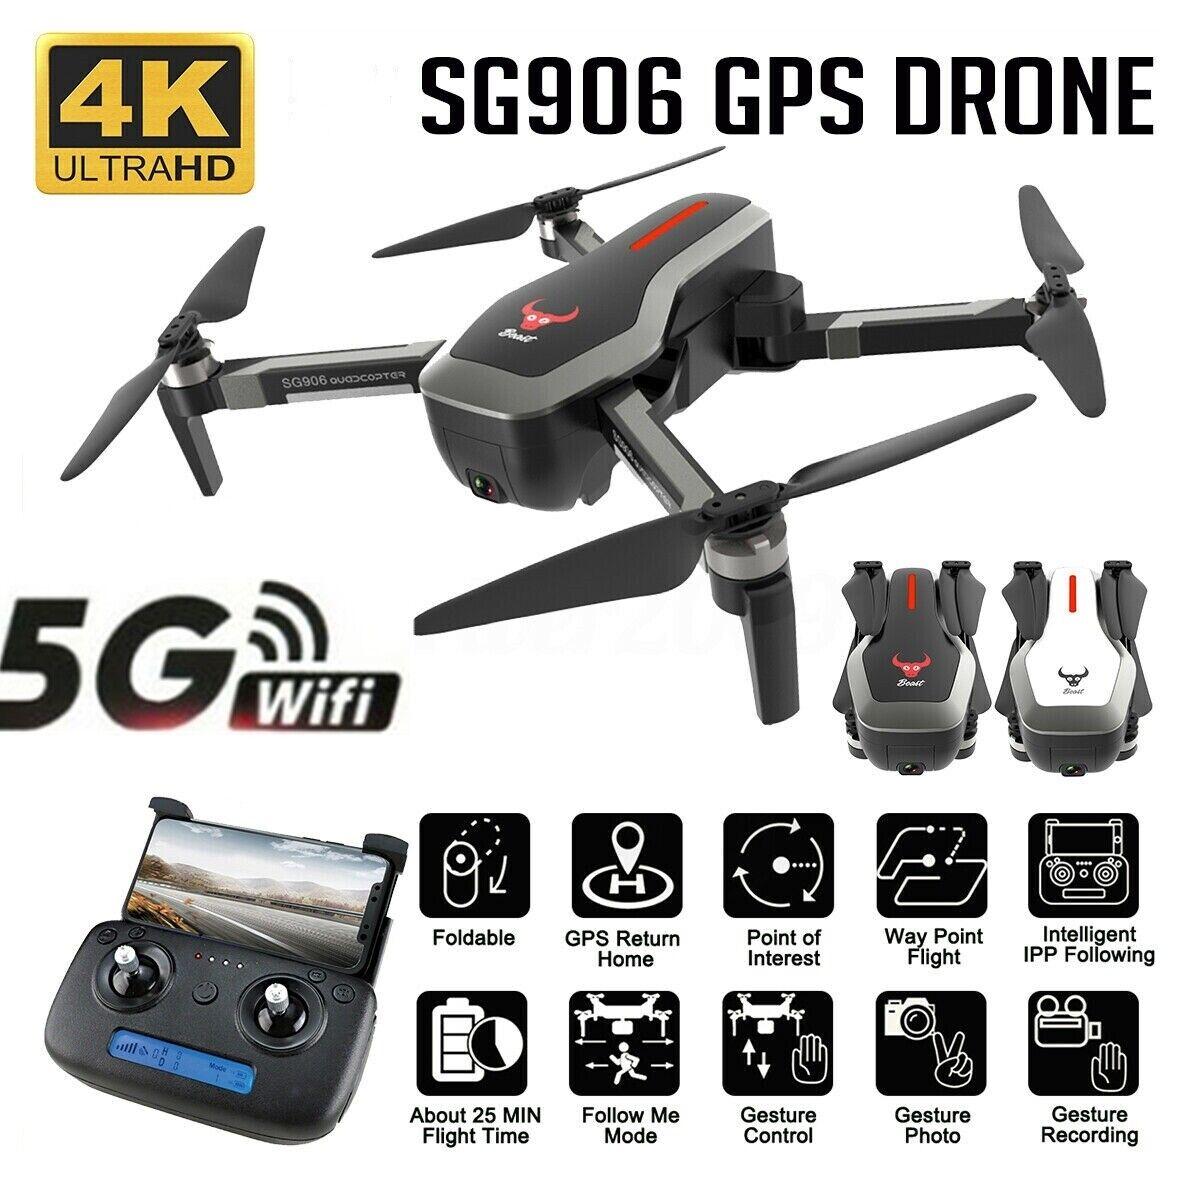 5G  WIFI FPV Drone 4K HD telecamera GPS Optical Flow Brushless Foldable RC Quadcopter  costo effettivo